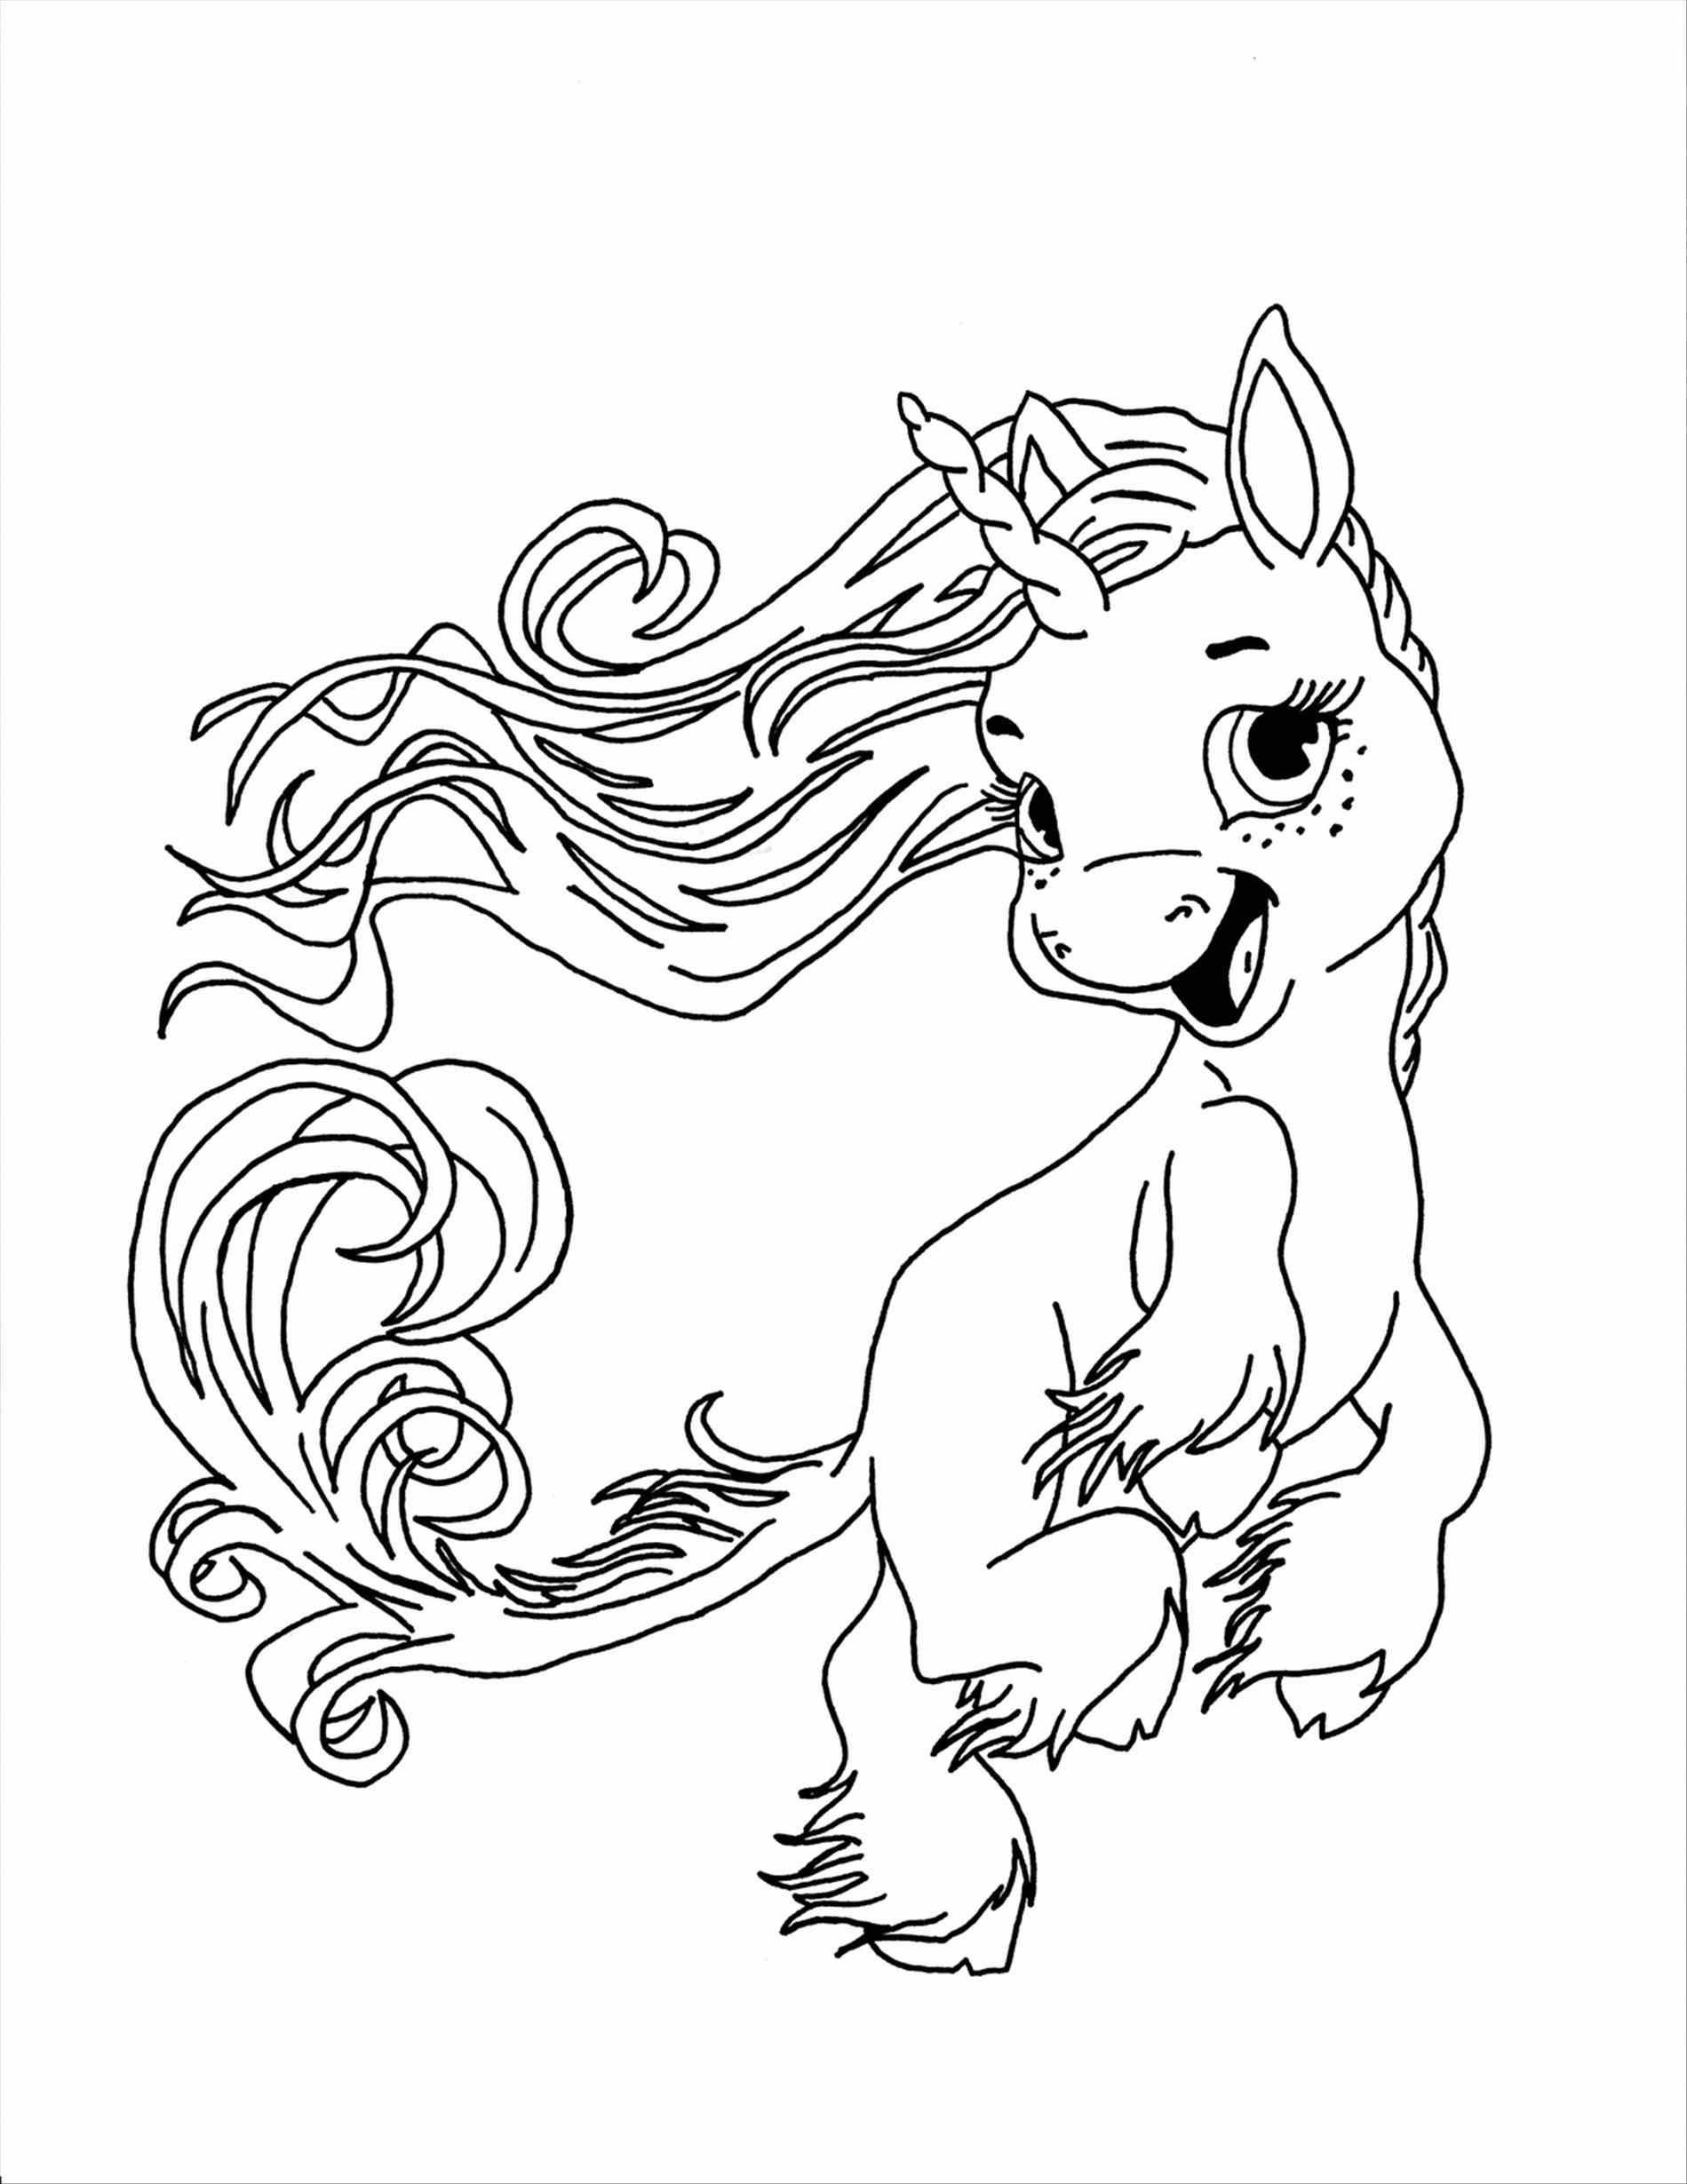 1899x2459 Narwhal With Page Creativemoveme Free Unicorn Kiopadme Free Anime